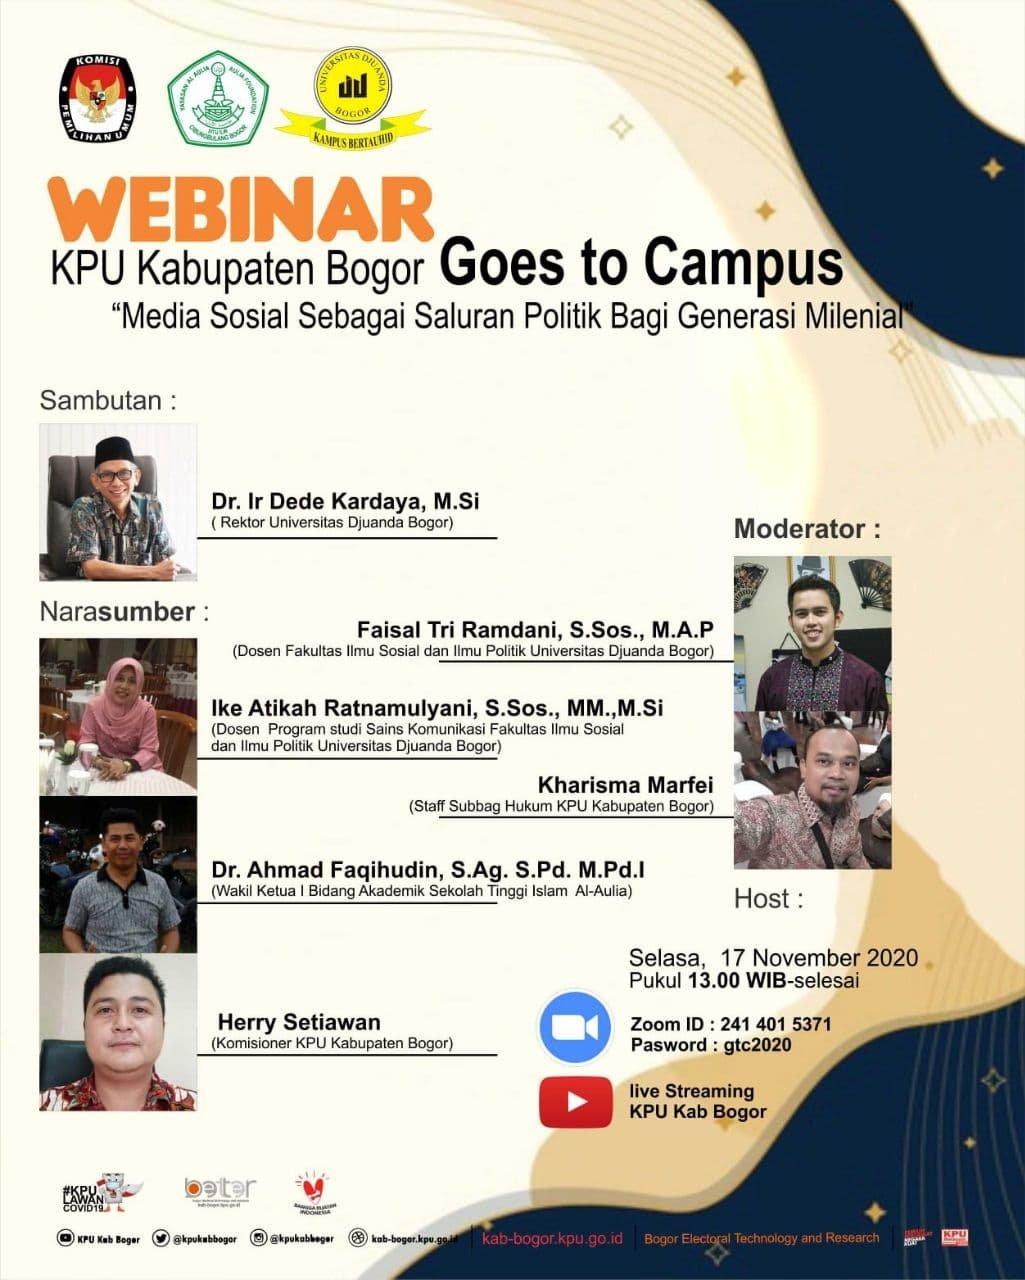 Webinar - KPU Kabupaten Bogor Goes to Campus